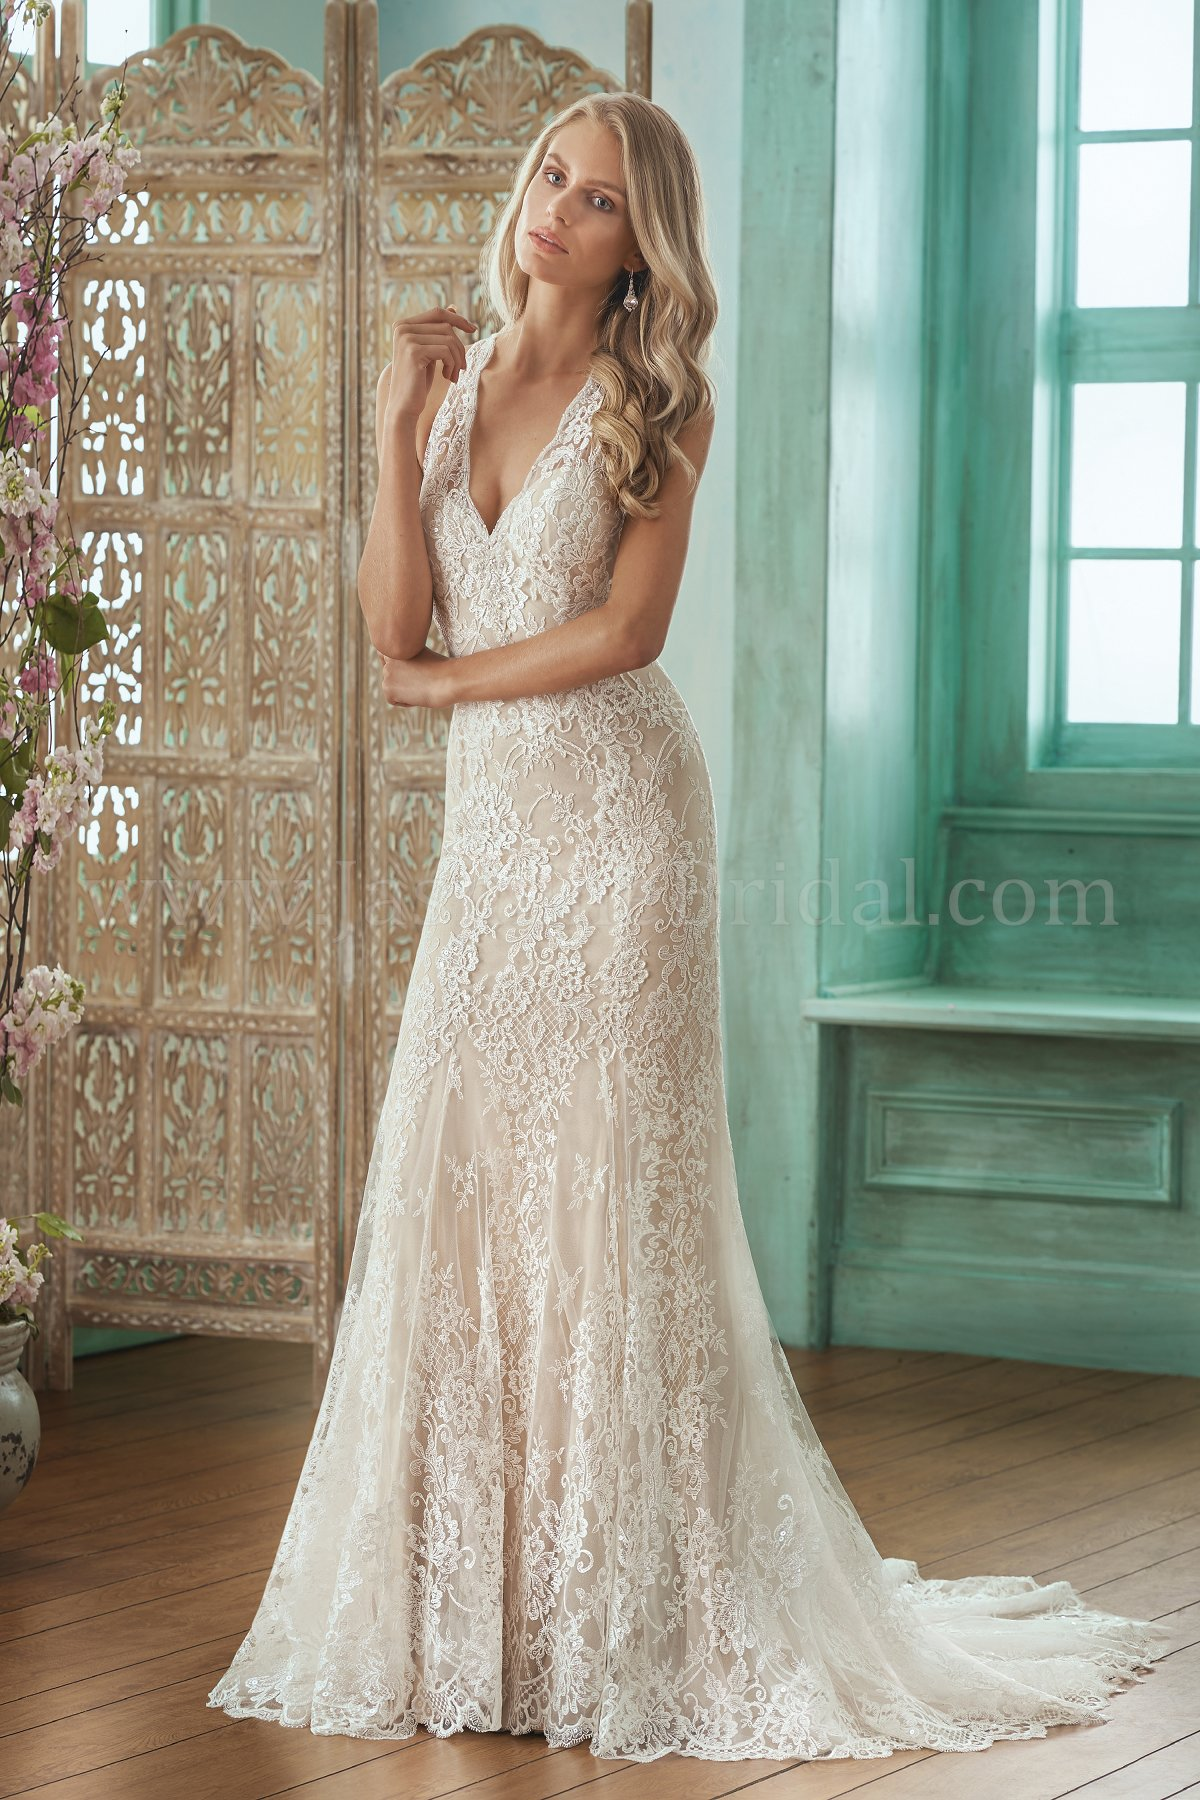 F201013 V-neck Sequin Lace & Silky Jersey Wedding Dress